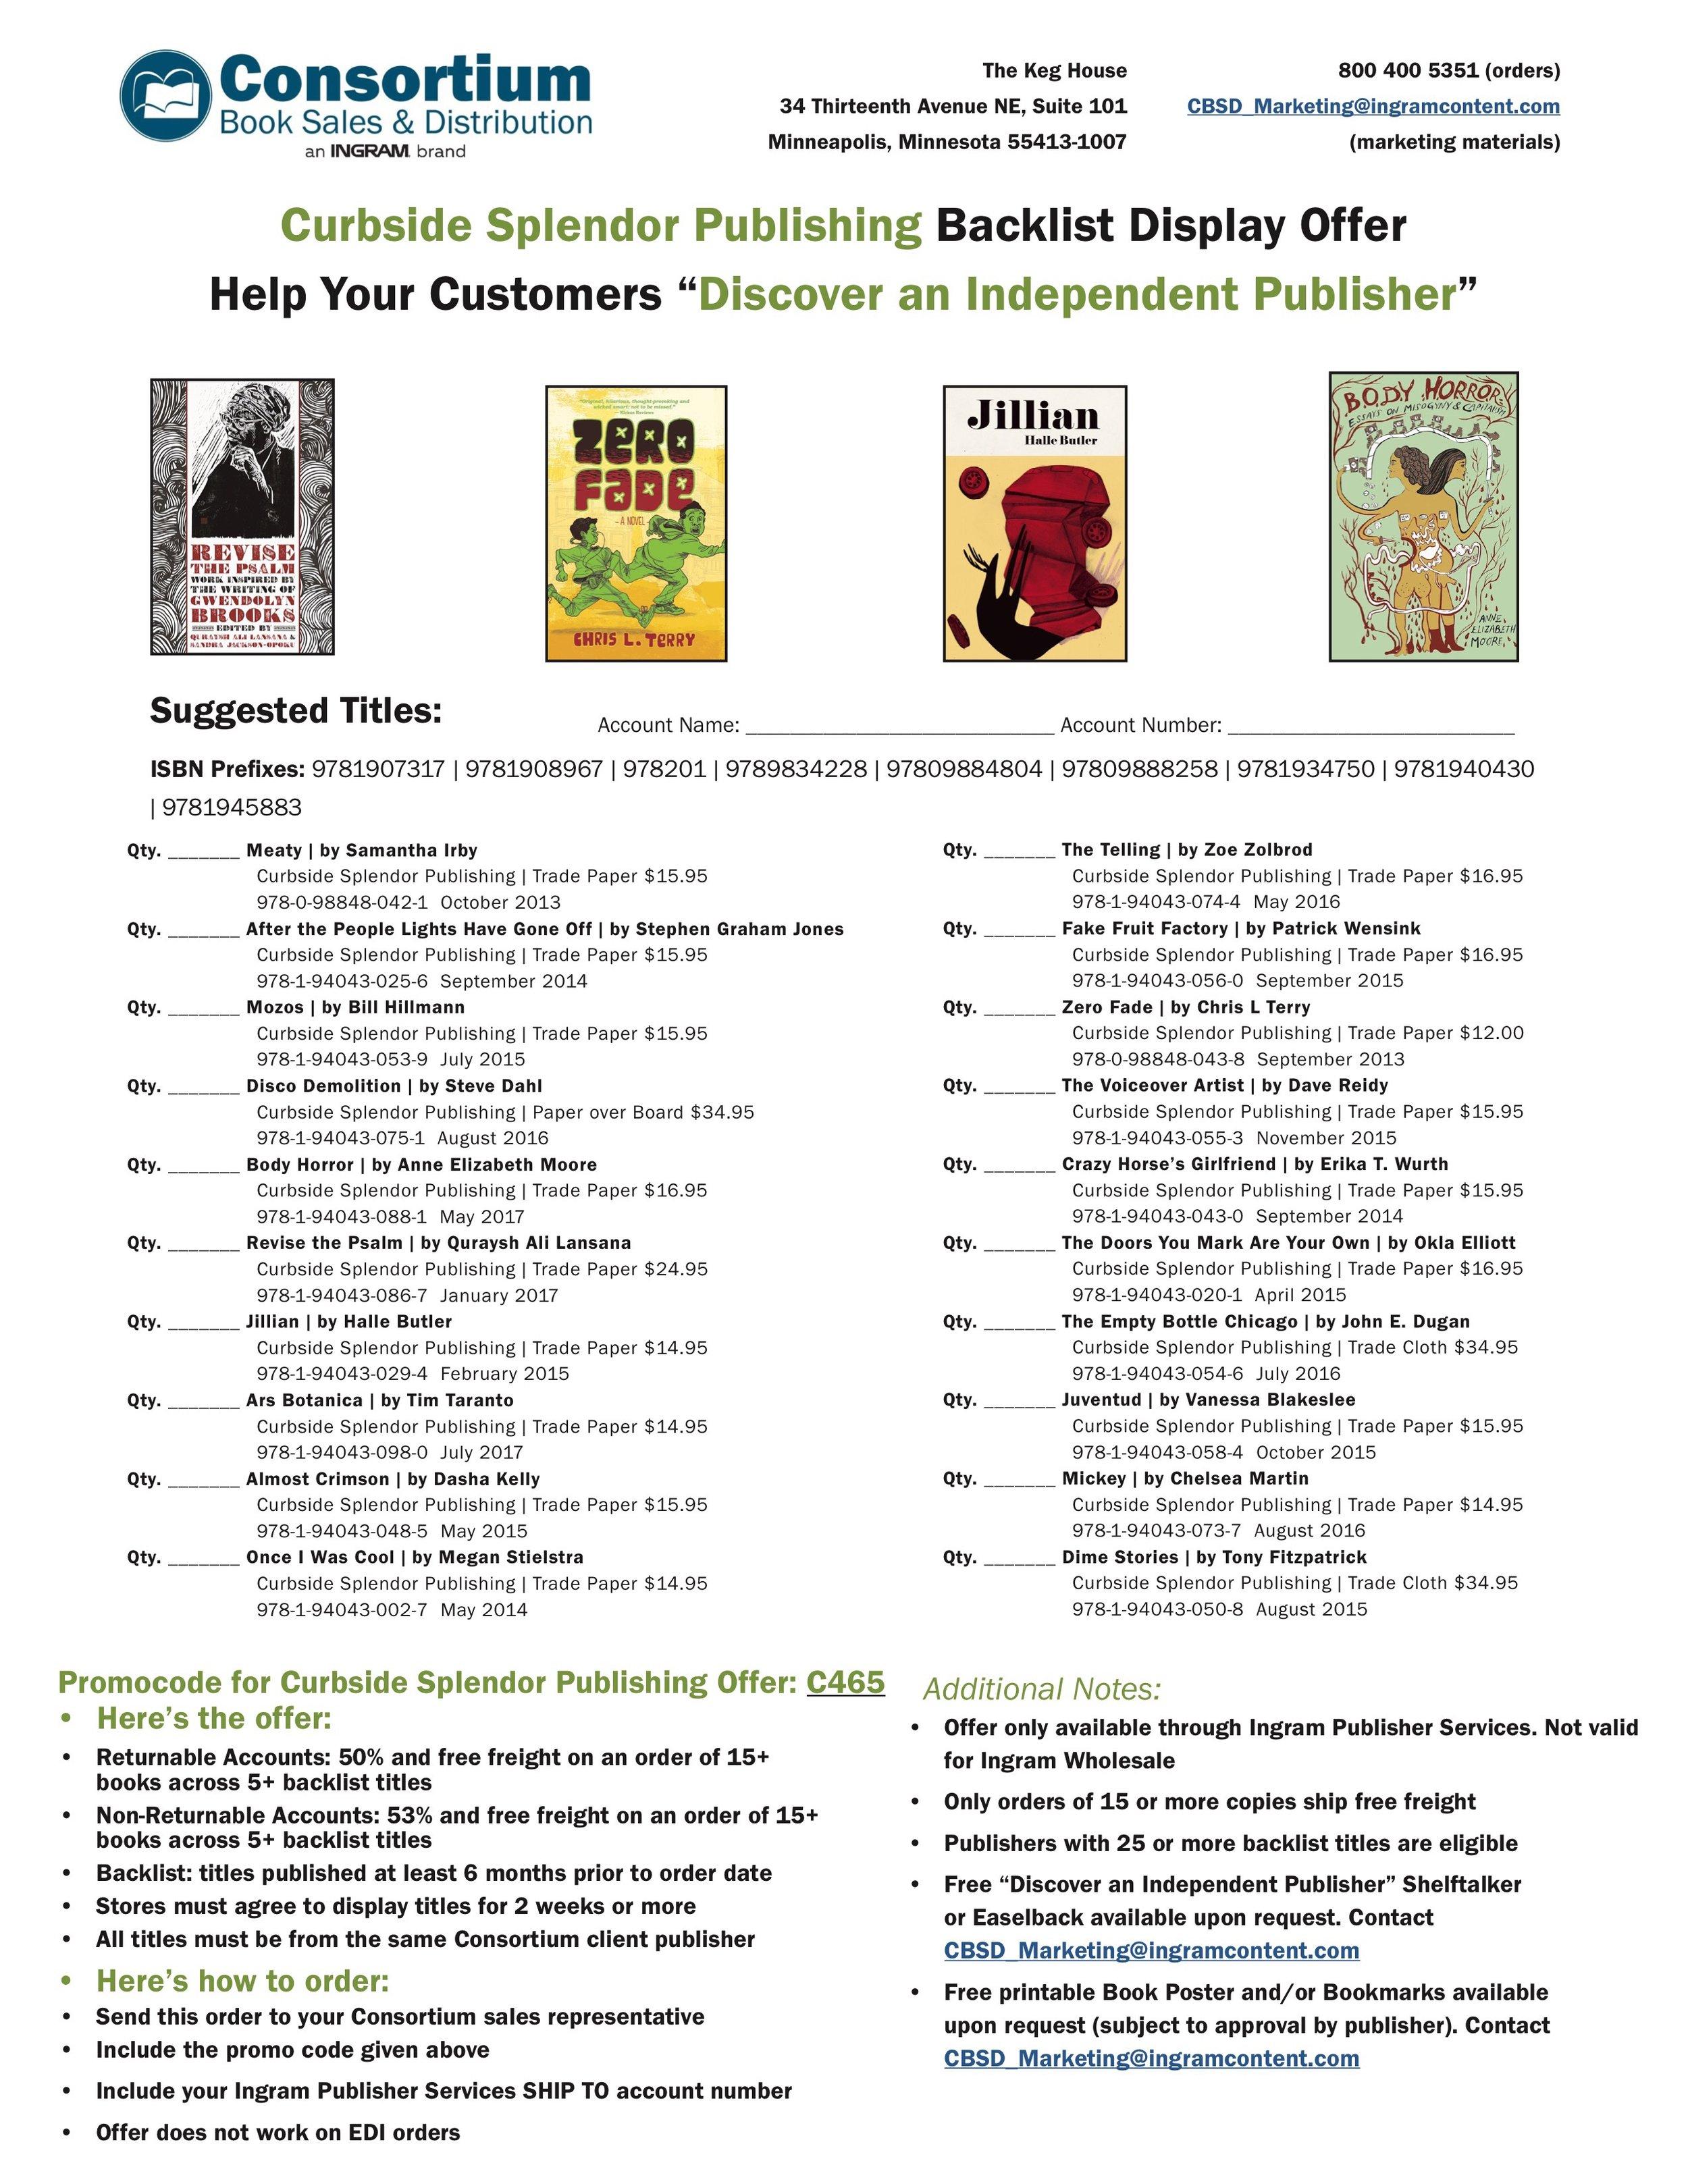 Curbside Splendor Publishing